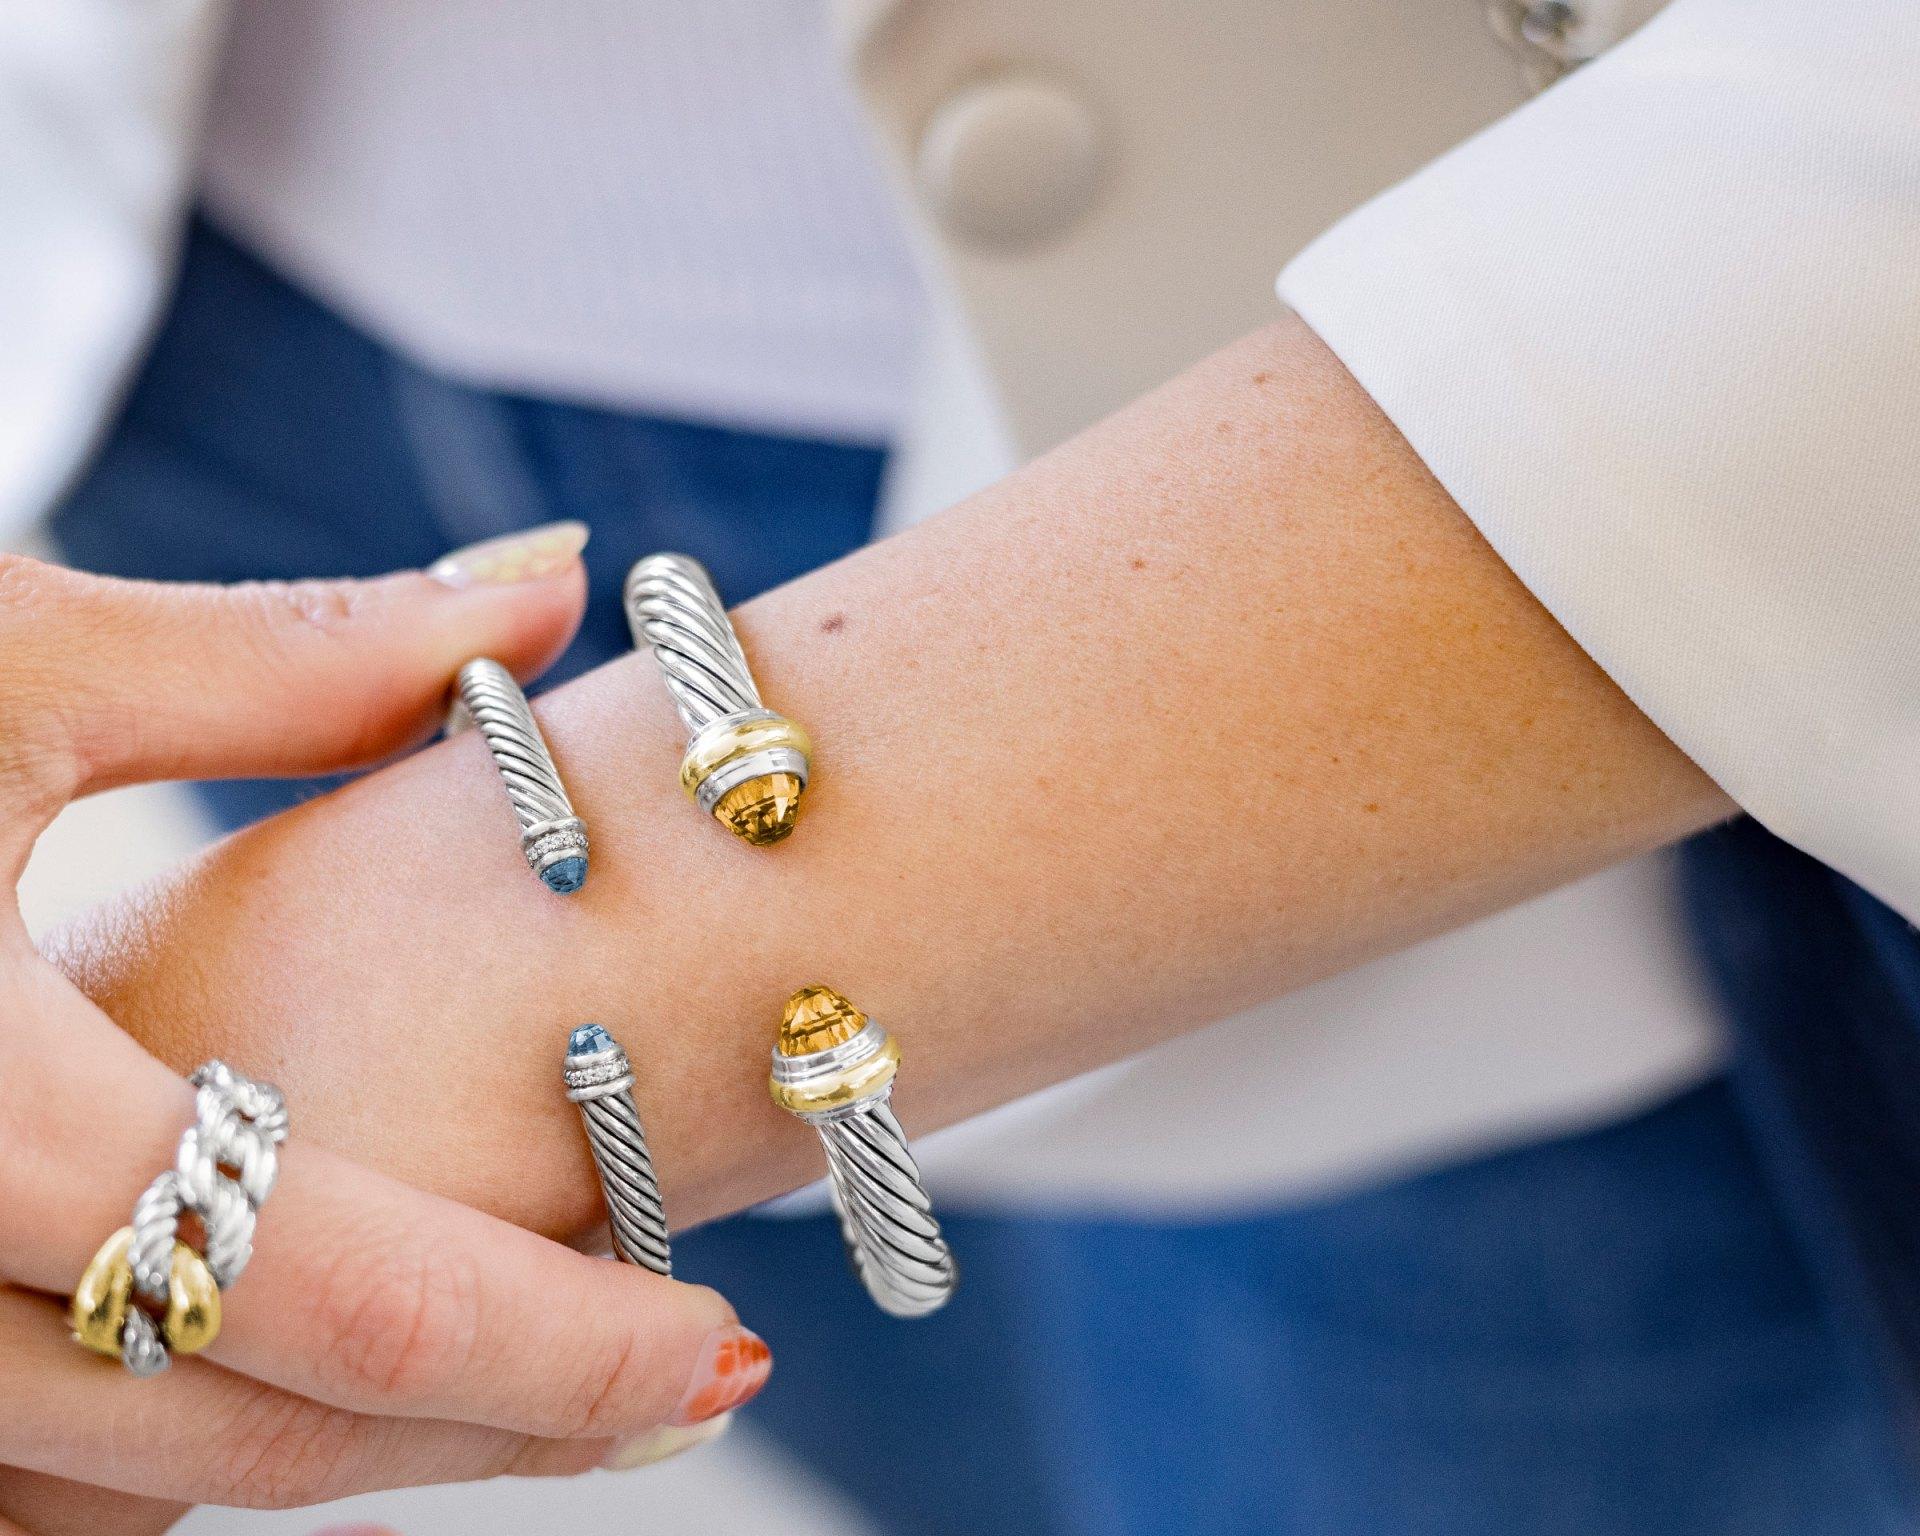 Two David Yurman cable bracelets on model's wrist and David Yurman ring lifestyle image